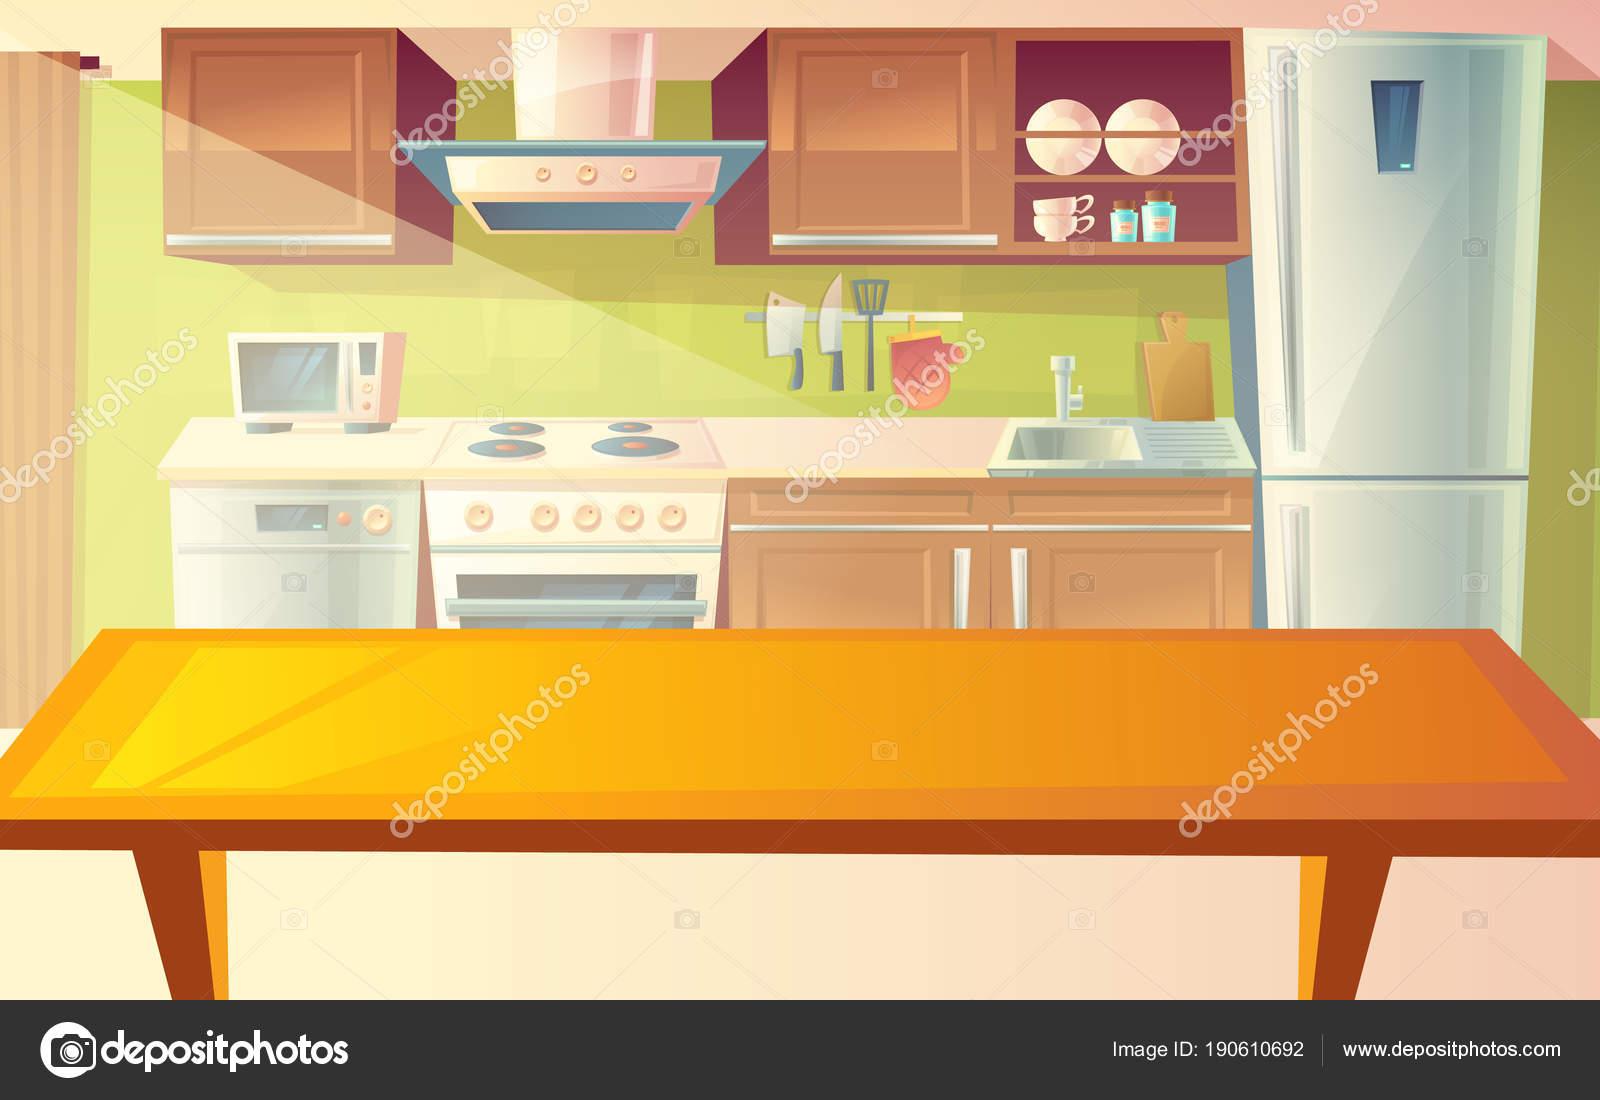 Ilustración Dibujos Animados Vector Acogedora Cocina Con